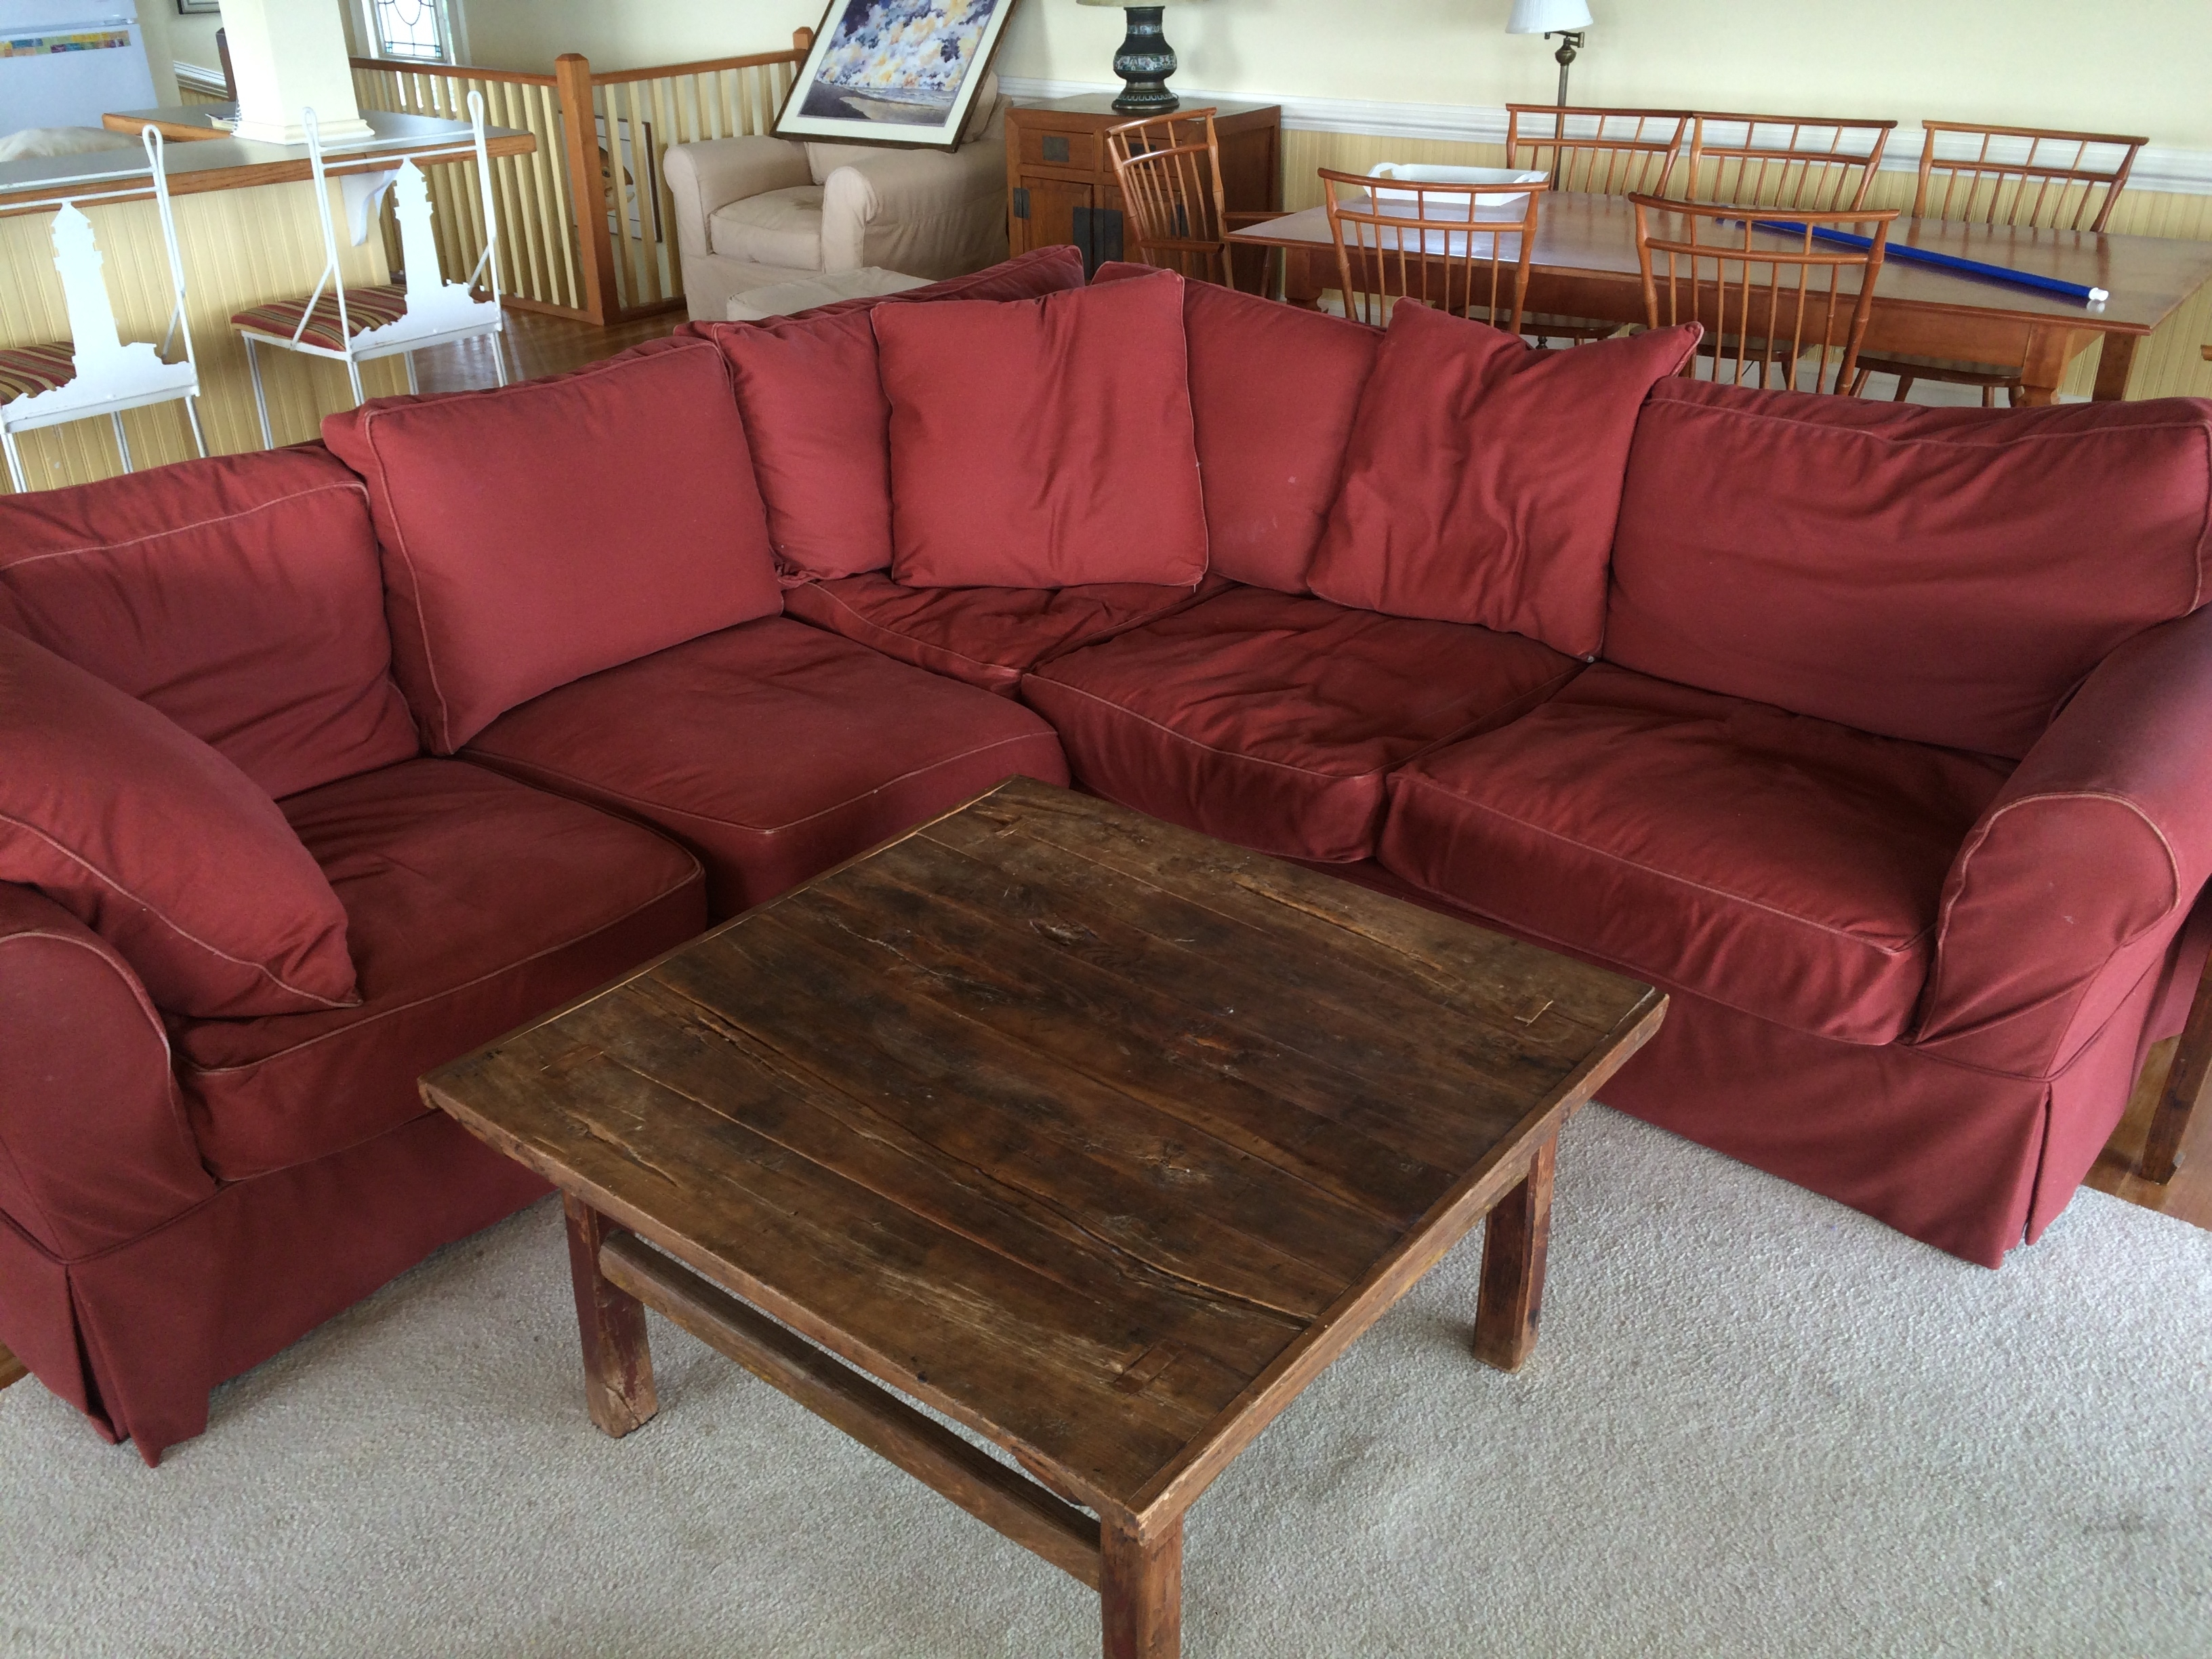 Down Filled Sectional Sofa – Hotelsbacau Intended For Down Filled Sectional Sofas (Image 4 of 10)